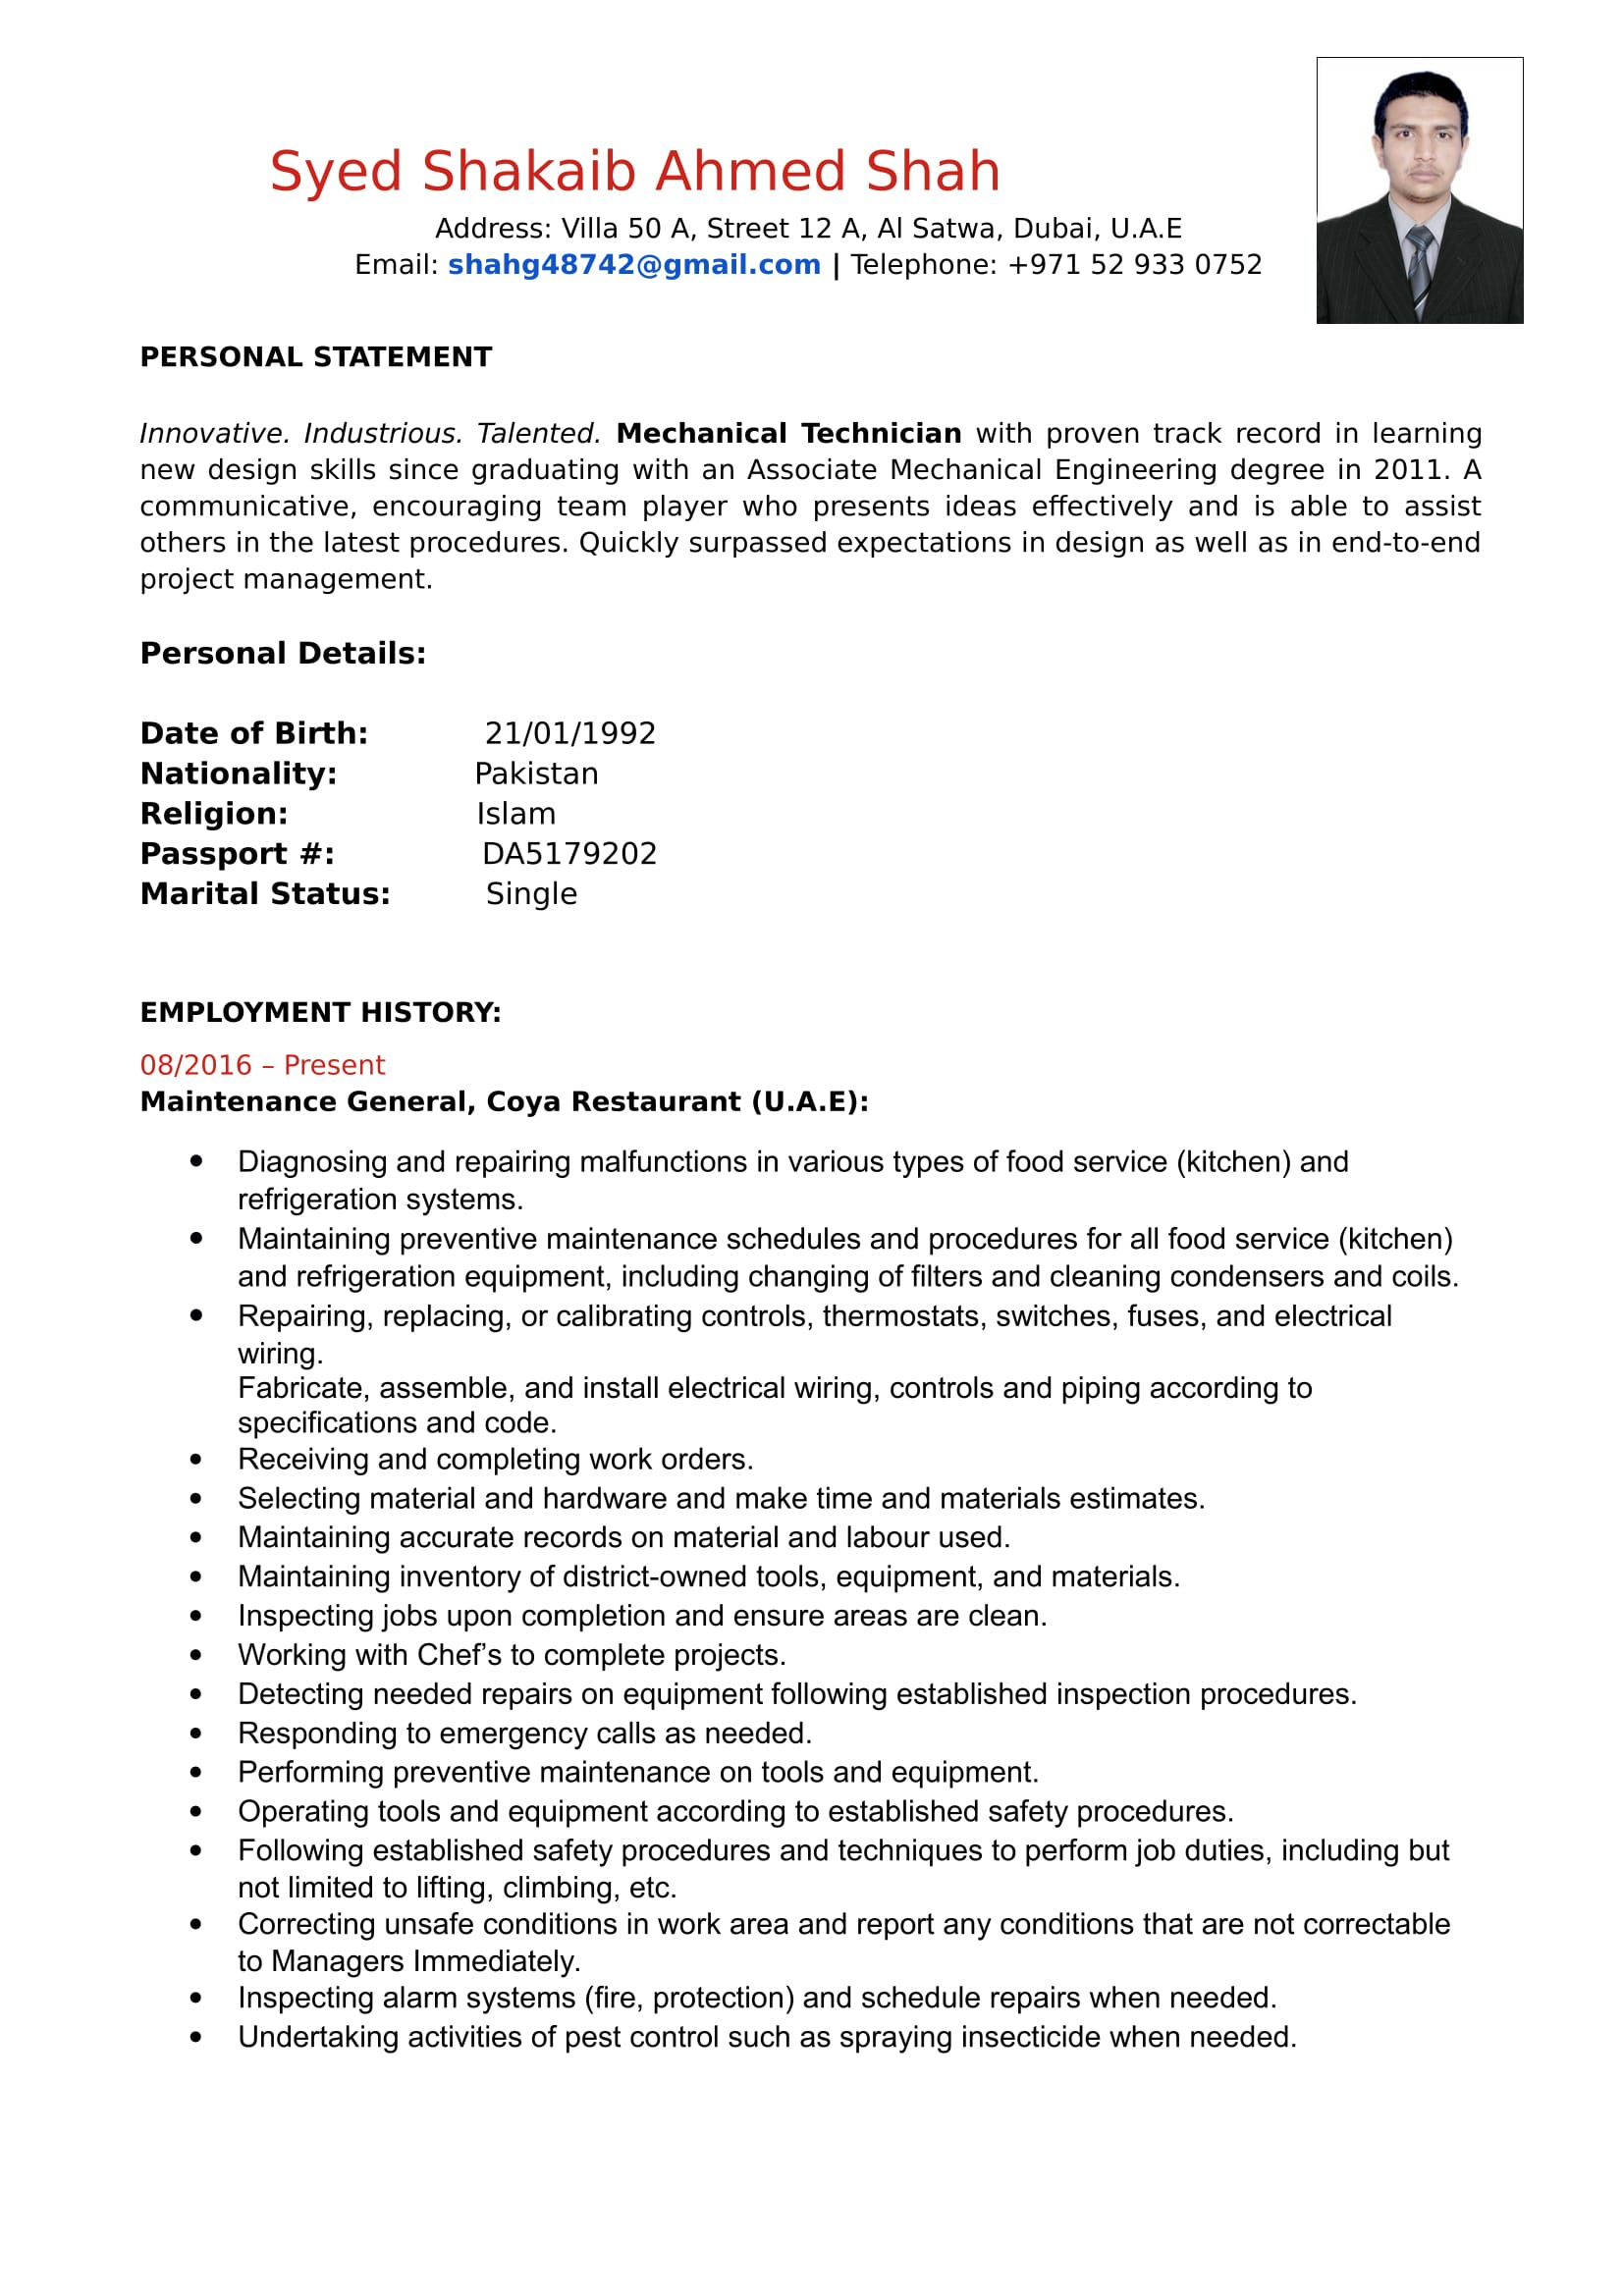 Resume Meaning Cvlist Luxmyst Com